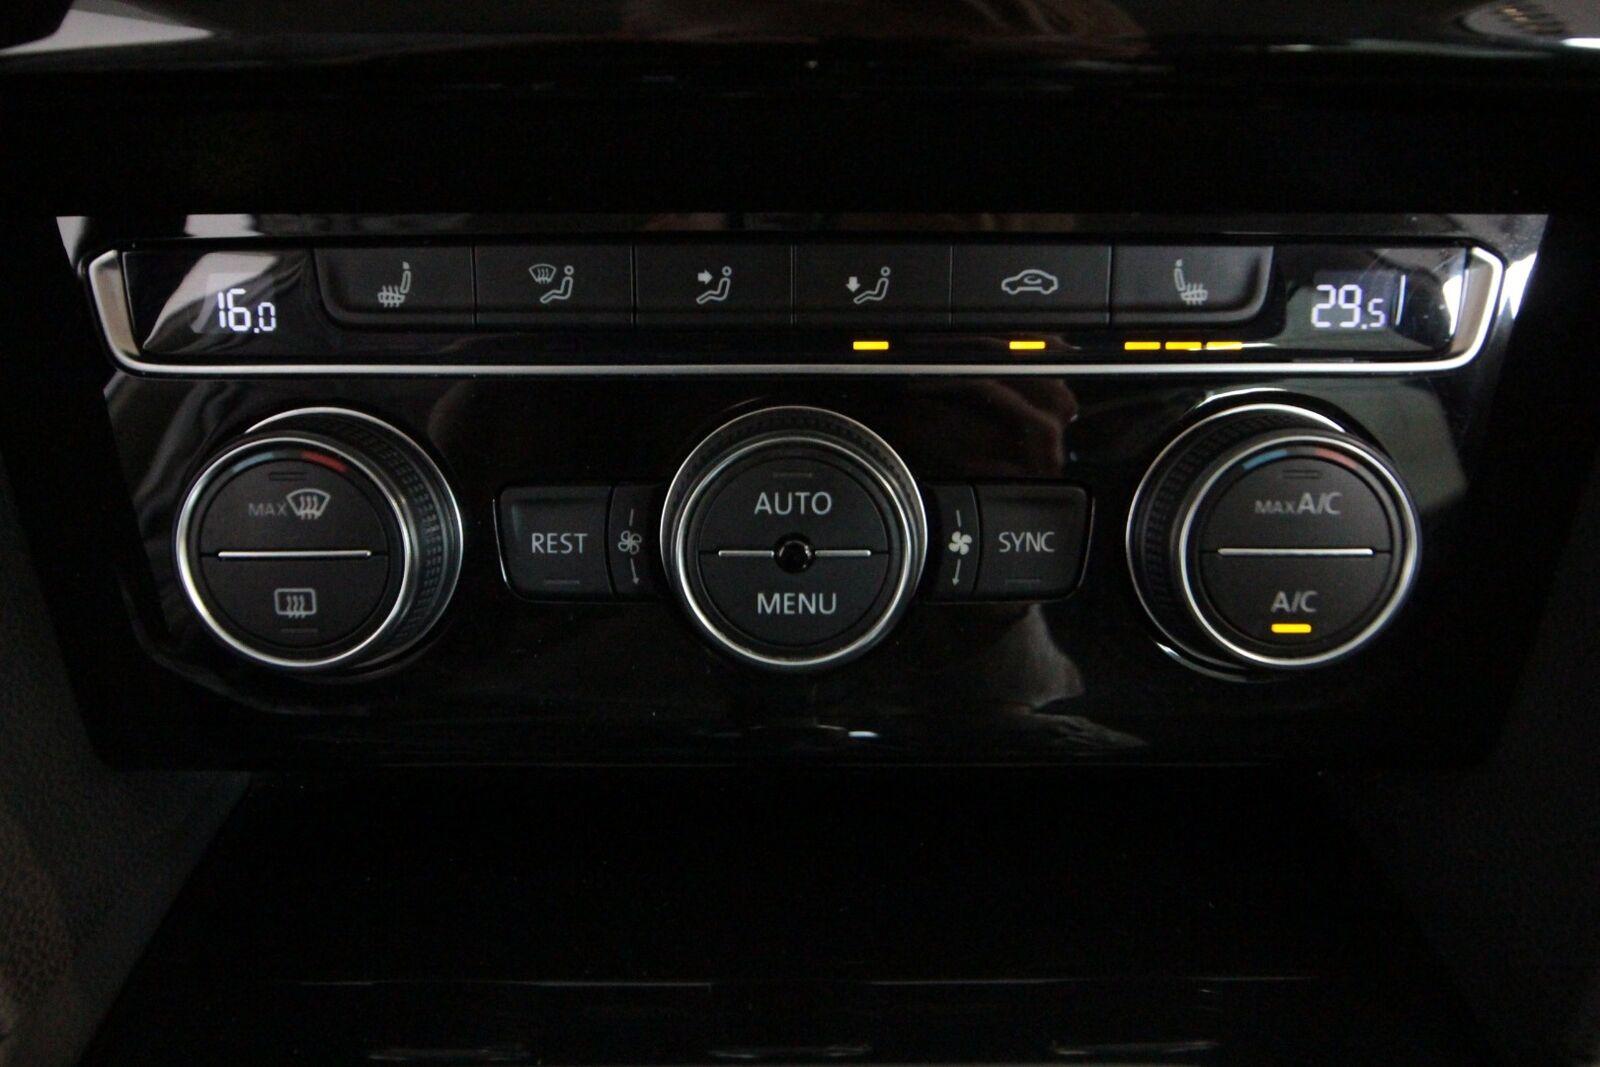 VW Passat TDi 150 High+ DSG